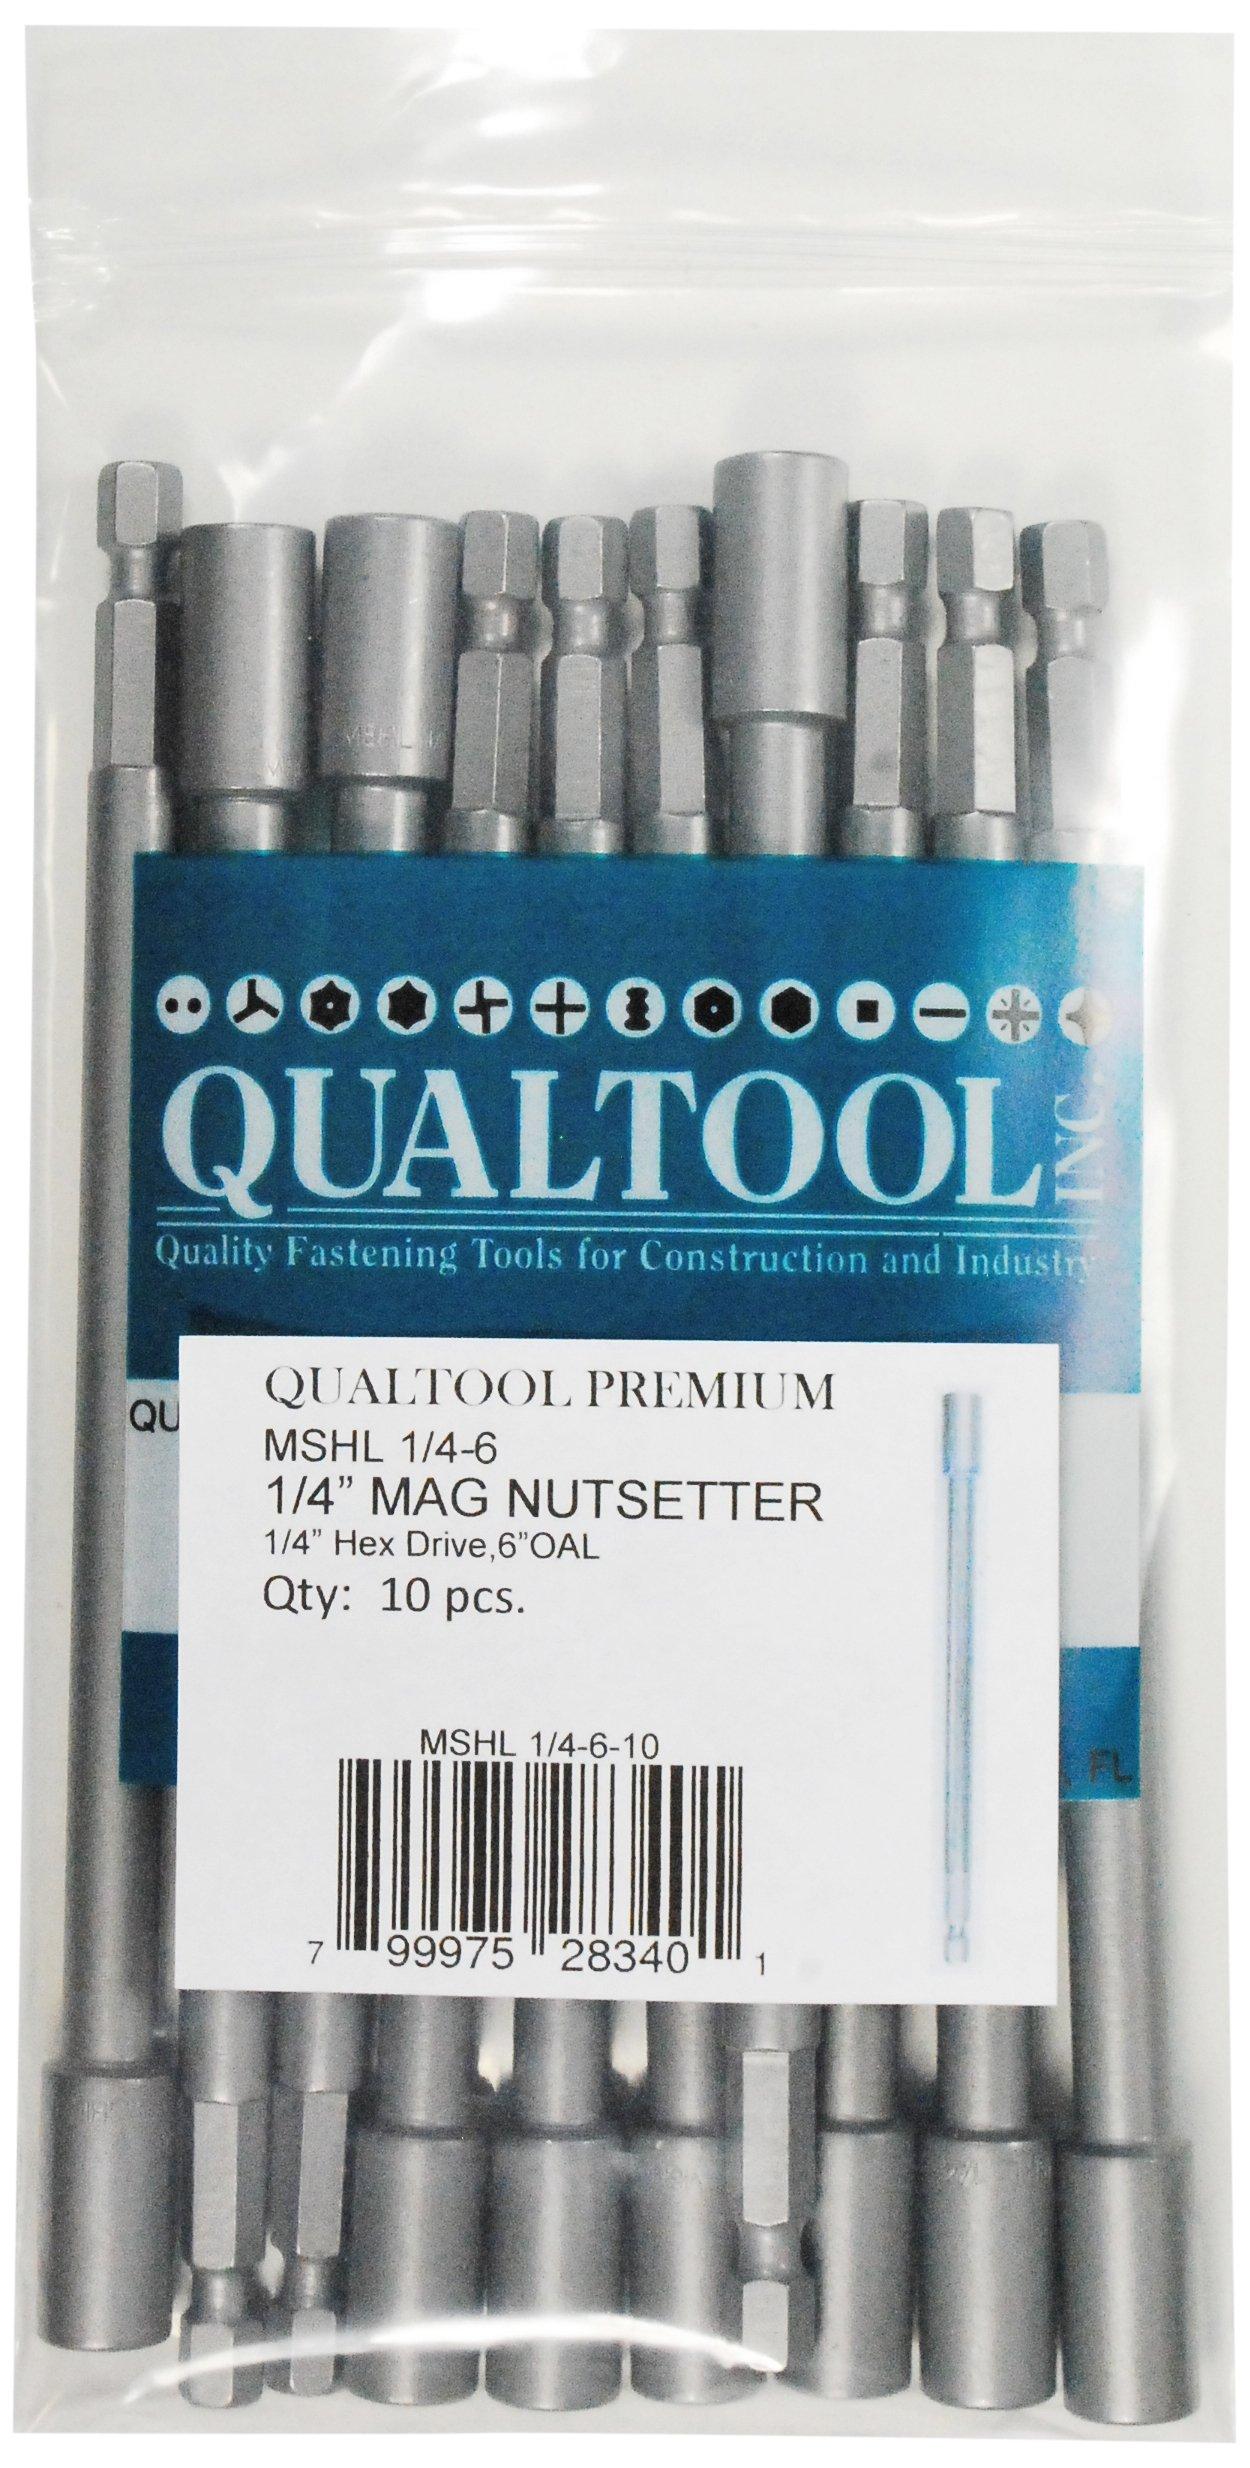 Qualtool Premium MSHL1/4-6-10 Magnetic 1/4-Inch Hex Extra Long Nutsetter, 10-Pack by Qualtool Premium